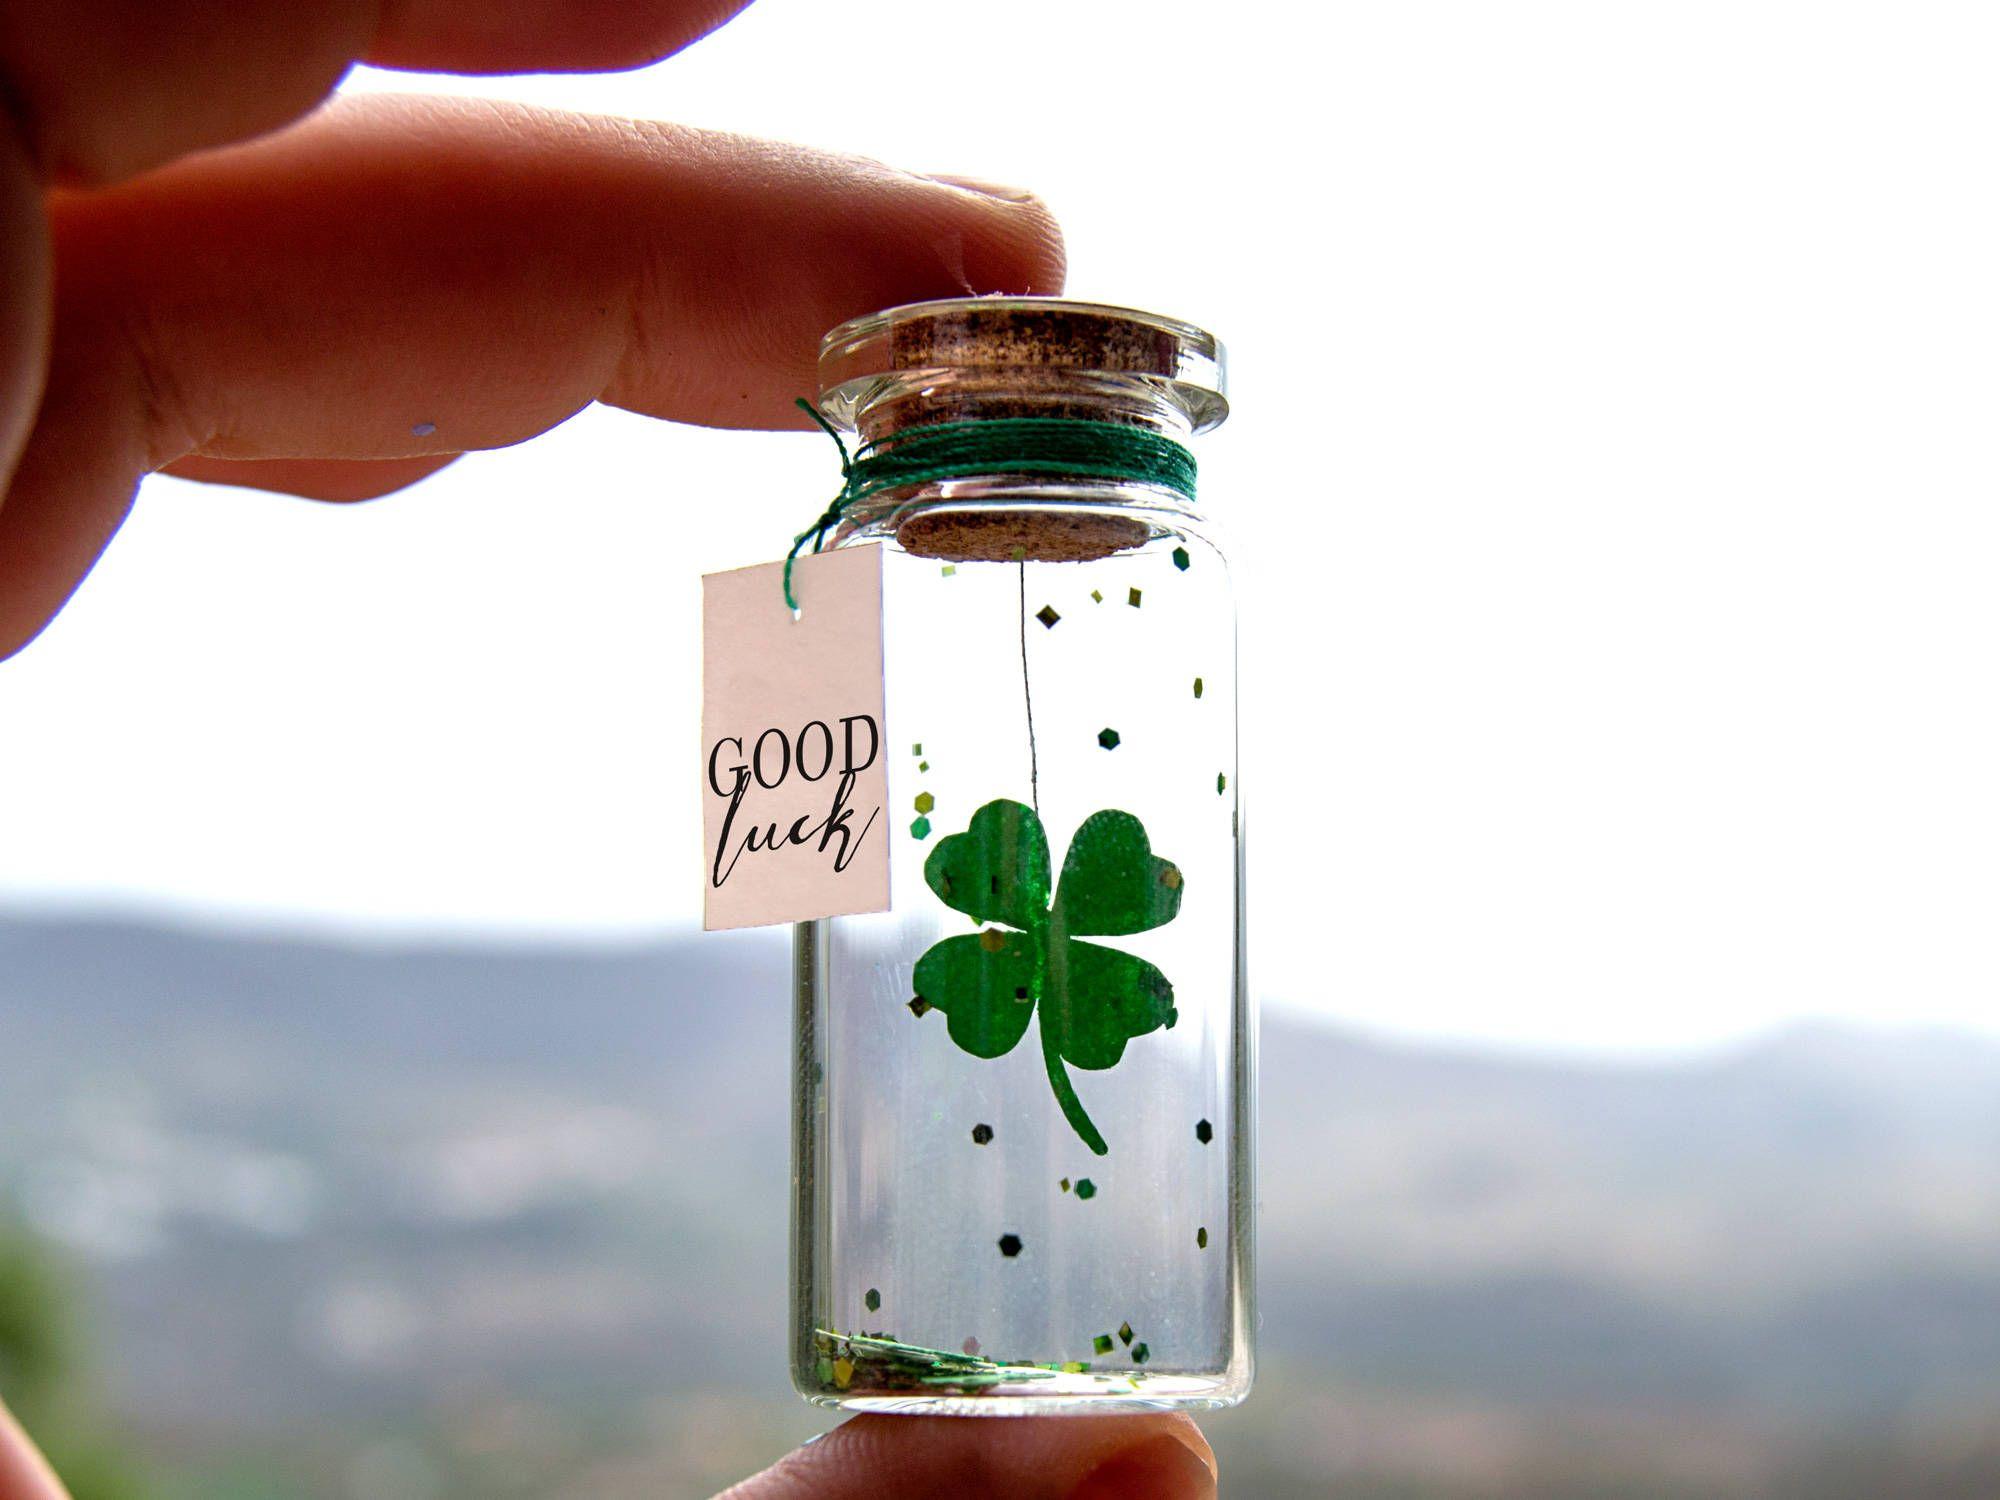 Buena Suerte Te Deseo Suerte Good Luck Mensaje En Una Botella